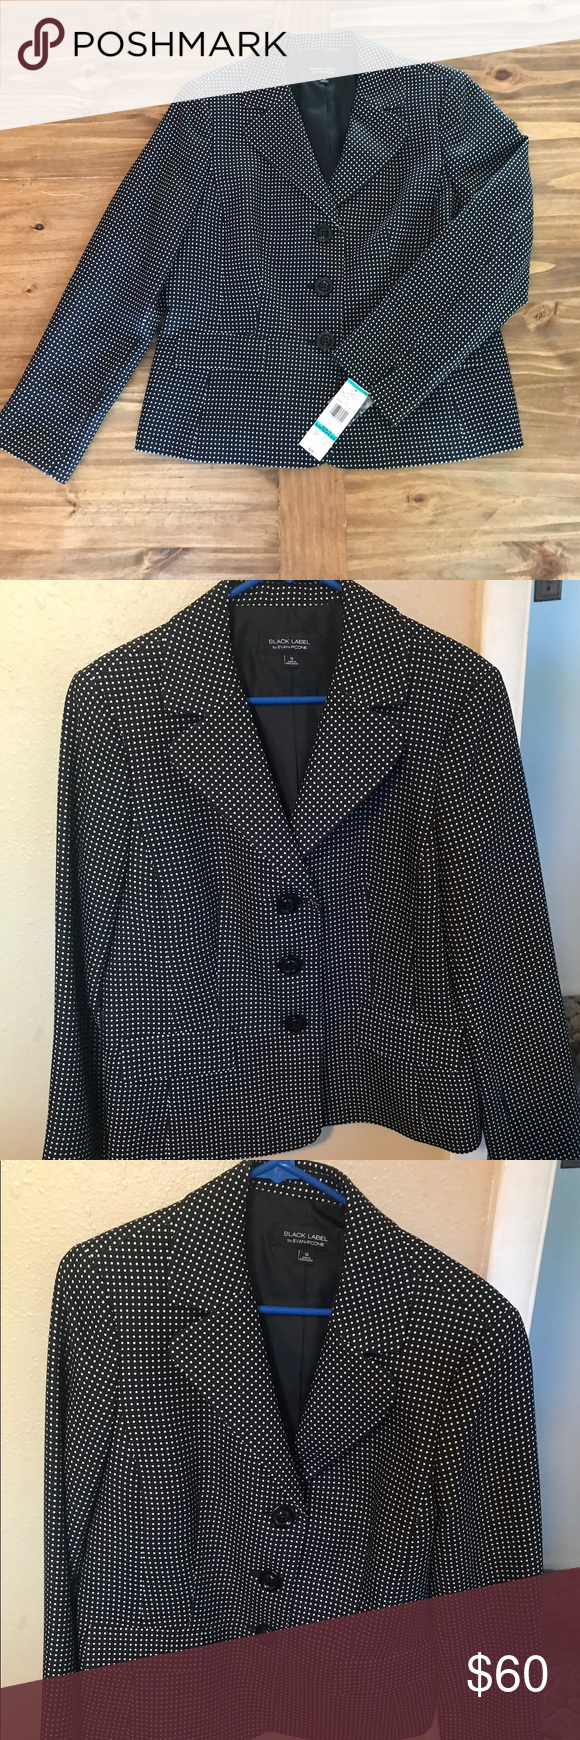 53e7289572 NWT  Black Label black blazer w  white dots Sz 16 Never worn